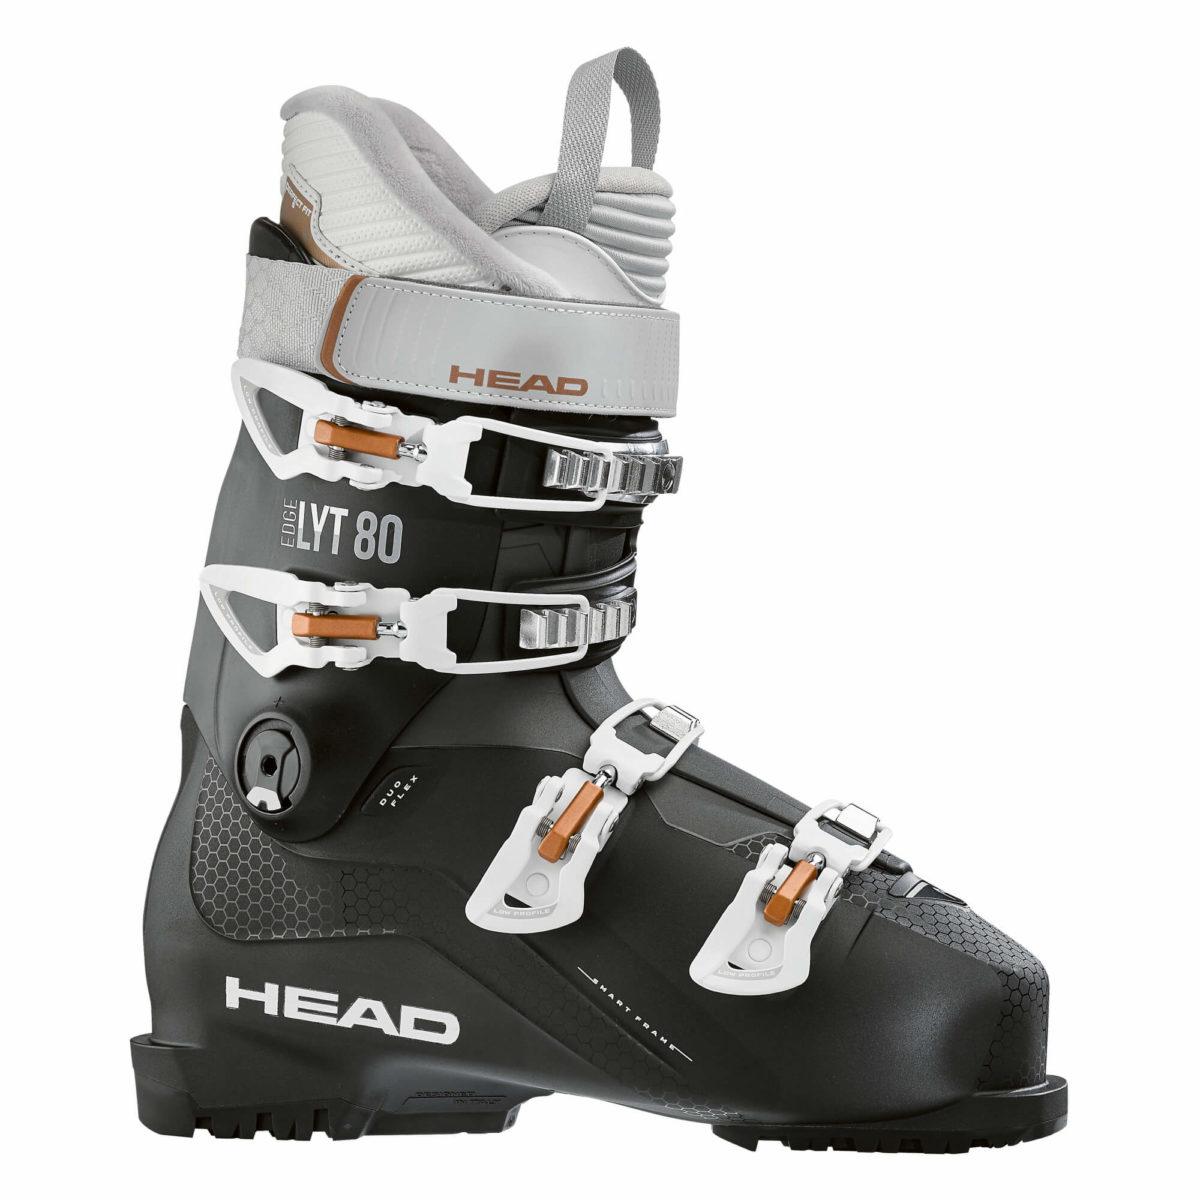 HEAD EDGE LYT 80 W Ботинки горнолыжные 609245 - 1